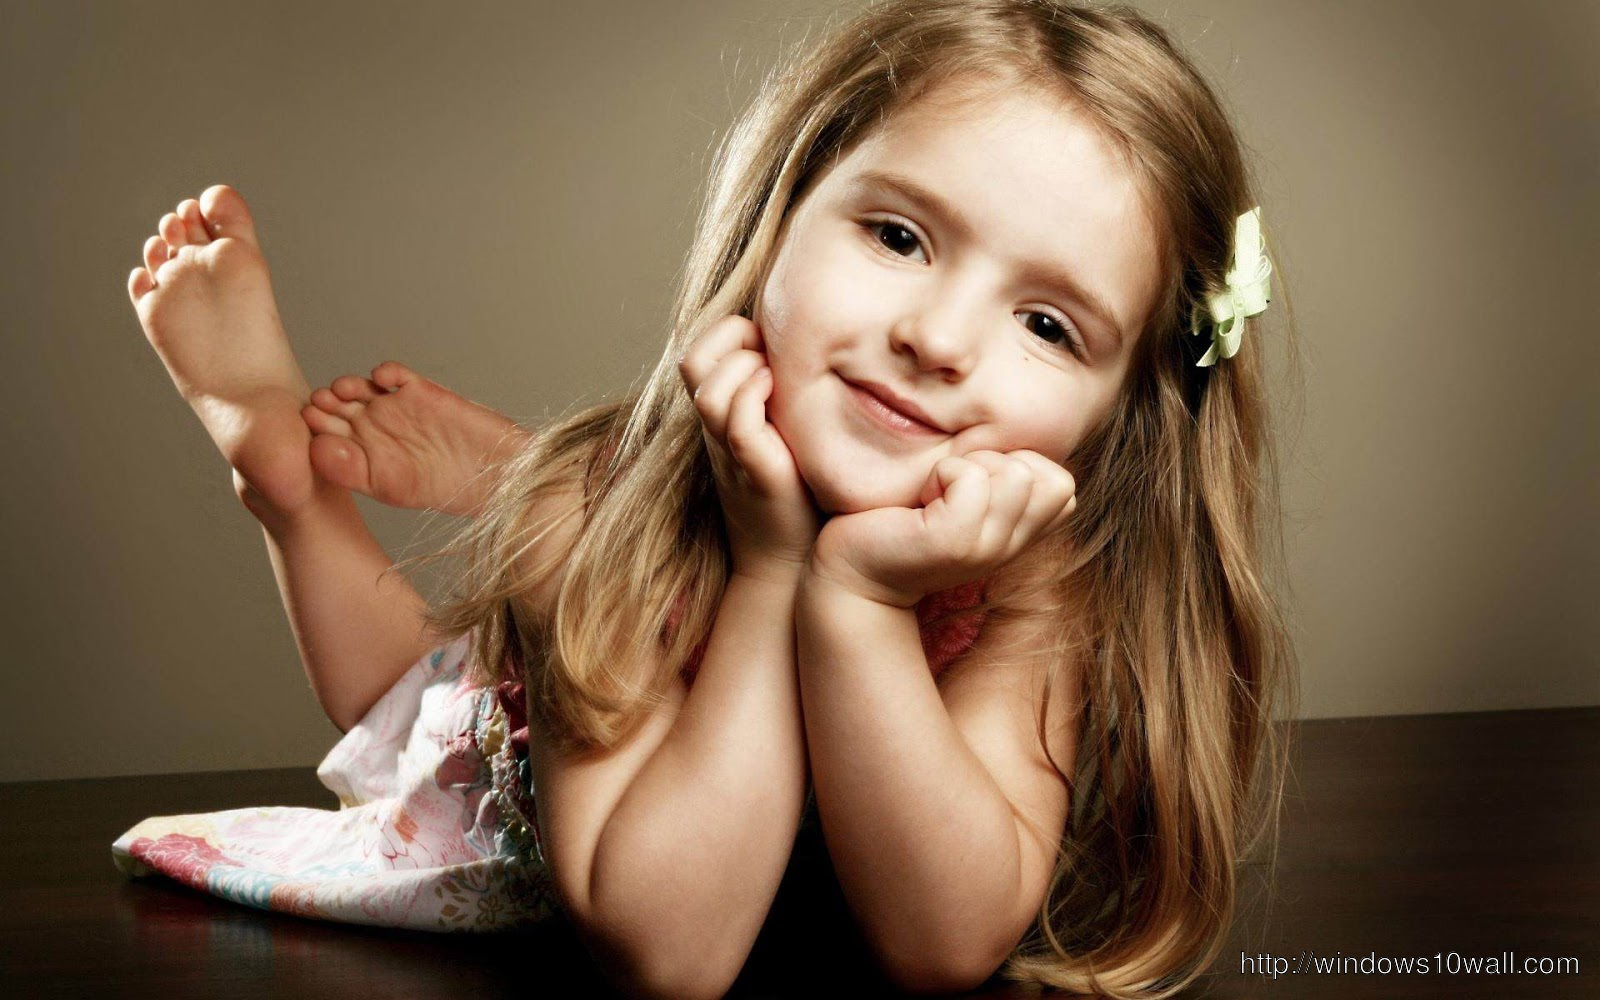 So Sweet Cute Baby Girl Wallpaper